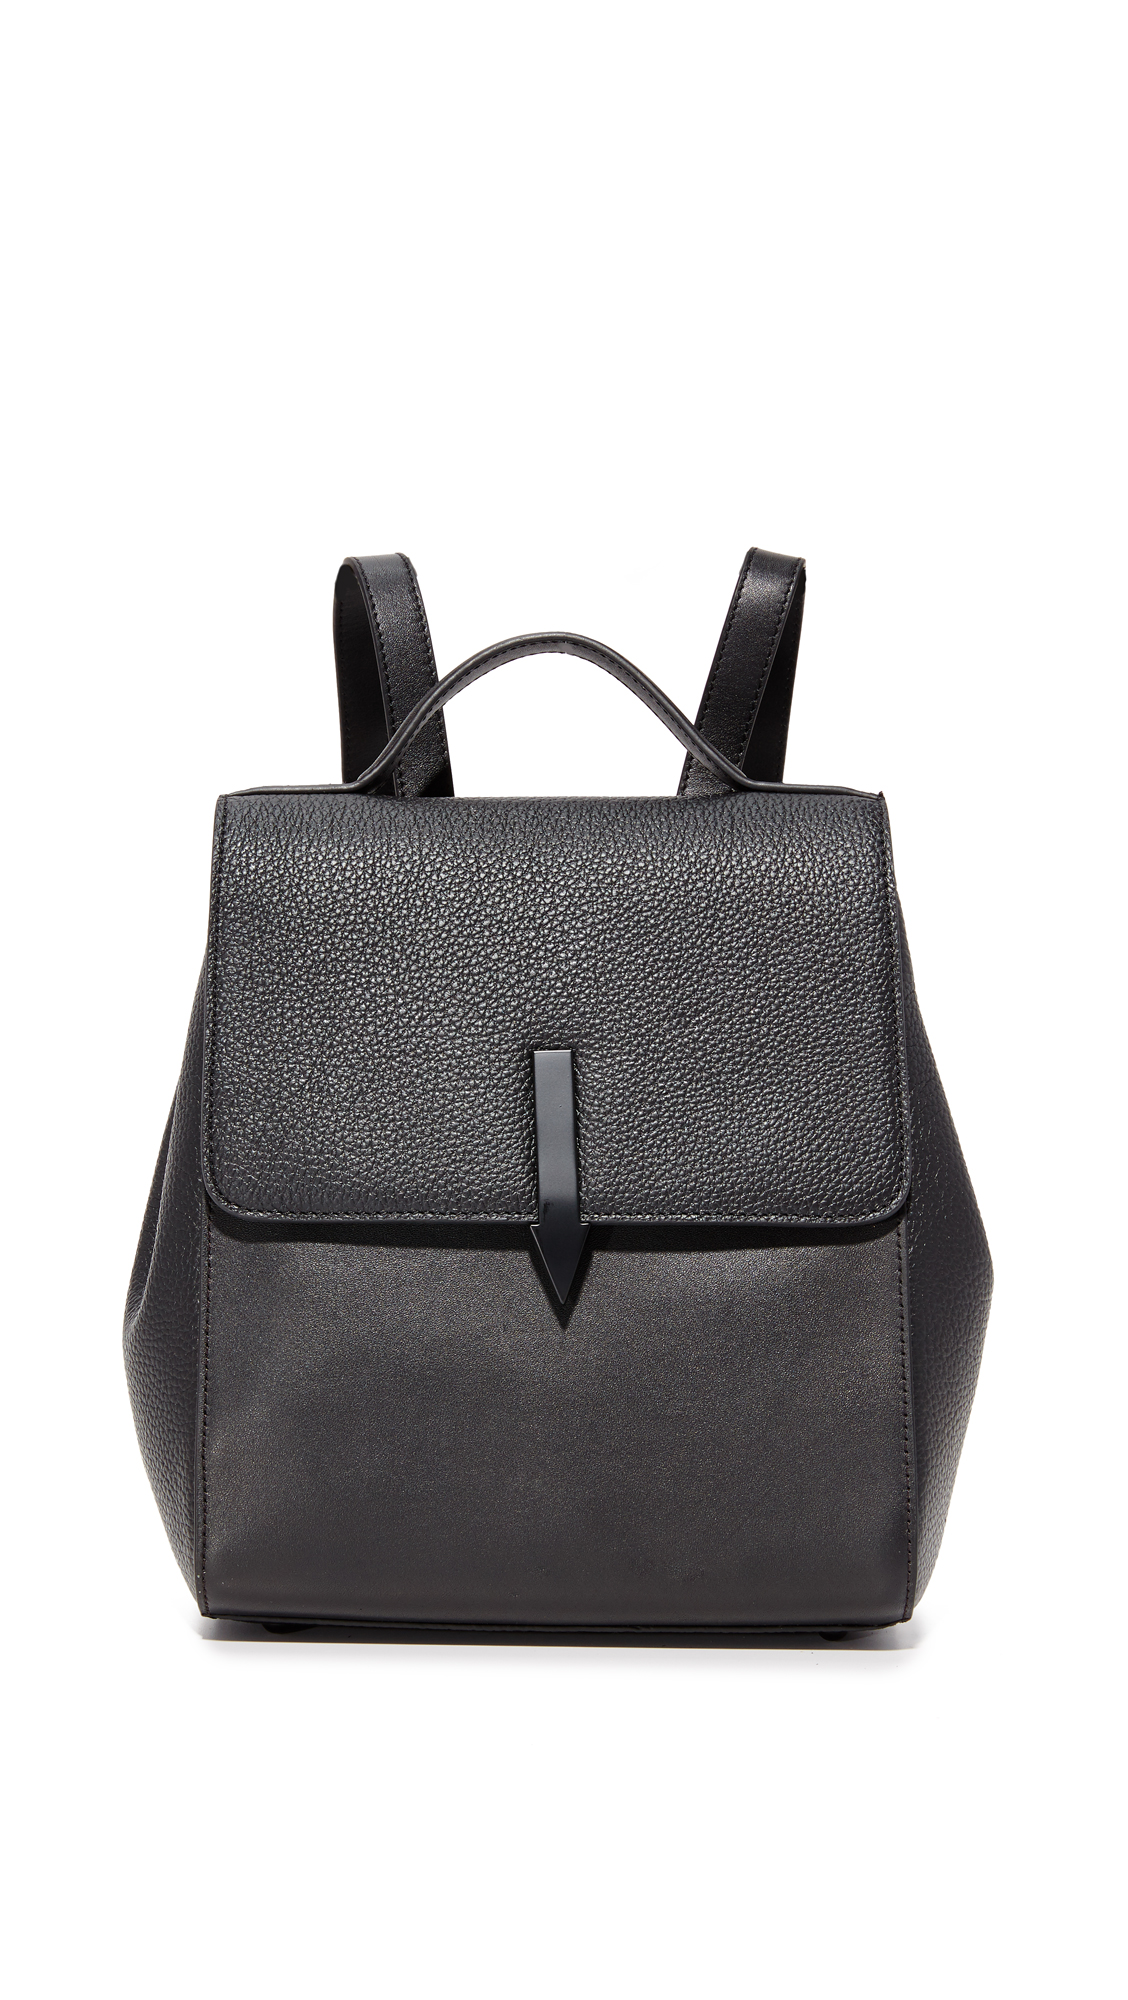 8e4309845dd Karen Walker Arrow Mini Backpack - Black   Shop Your Way: Online ...